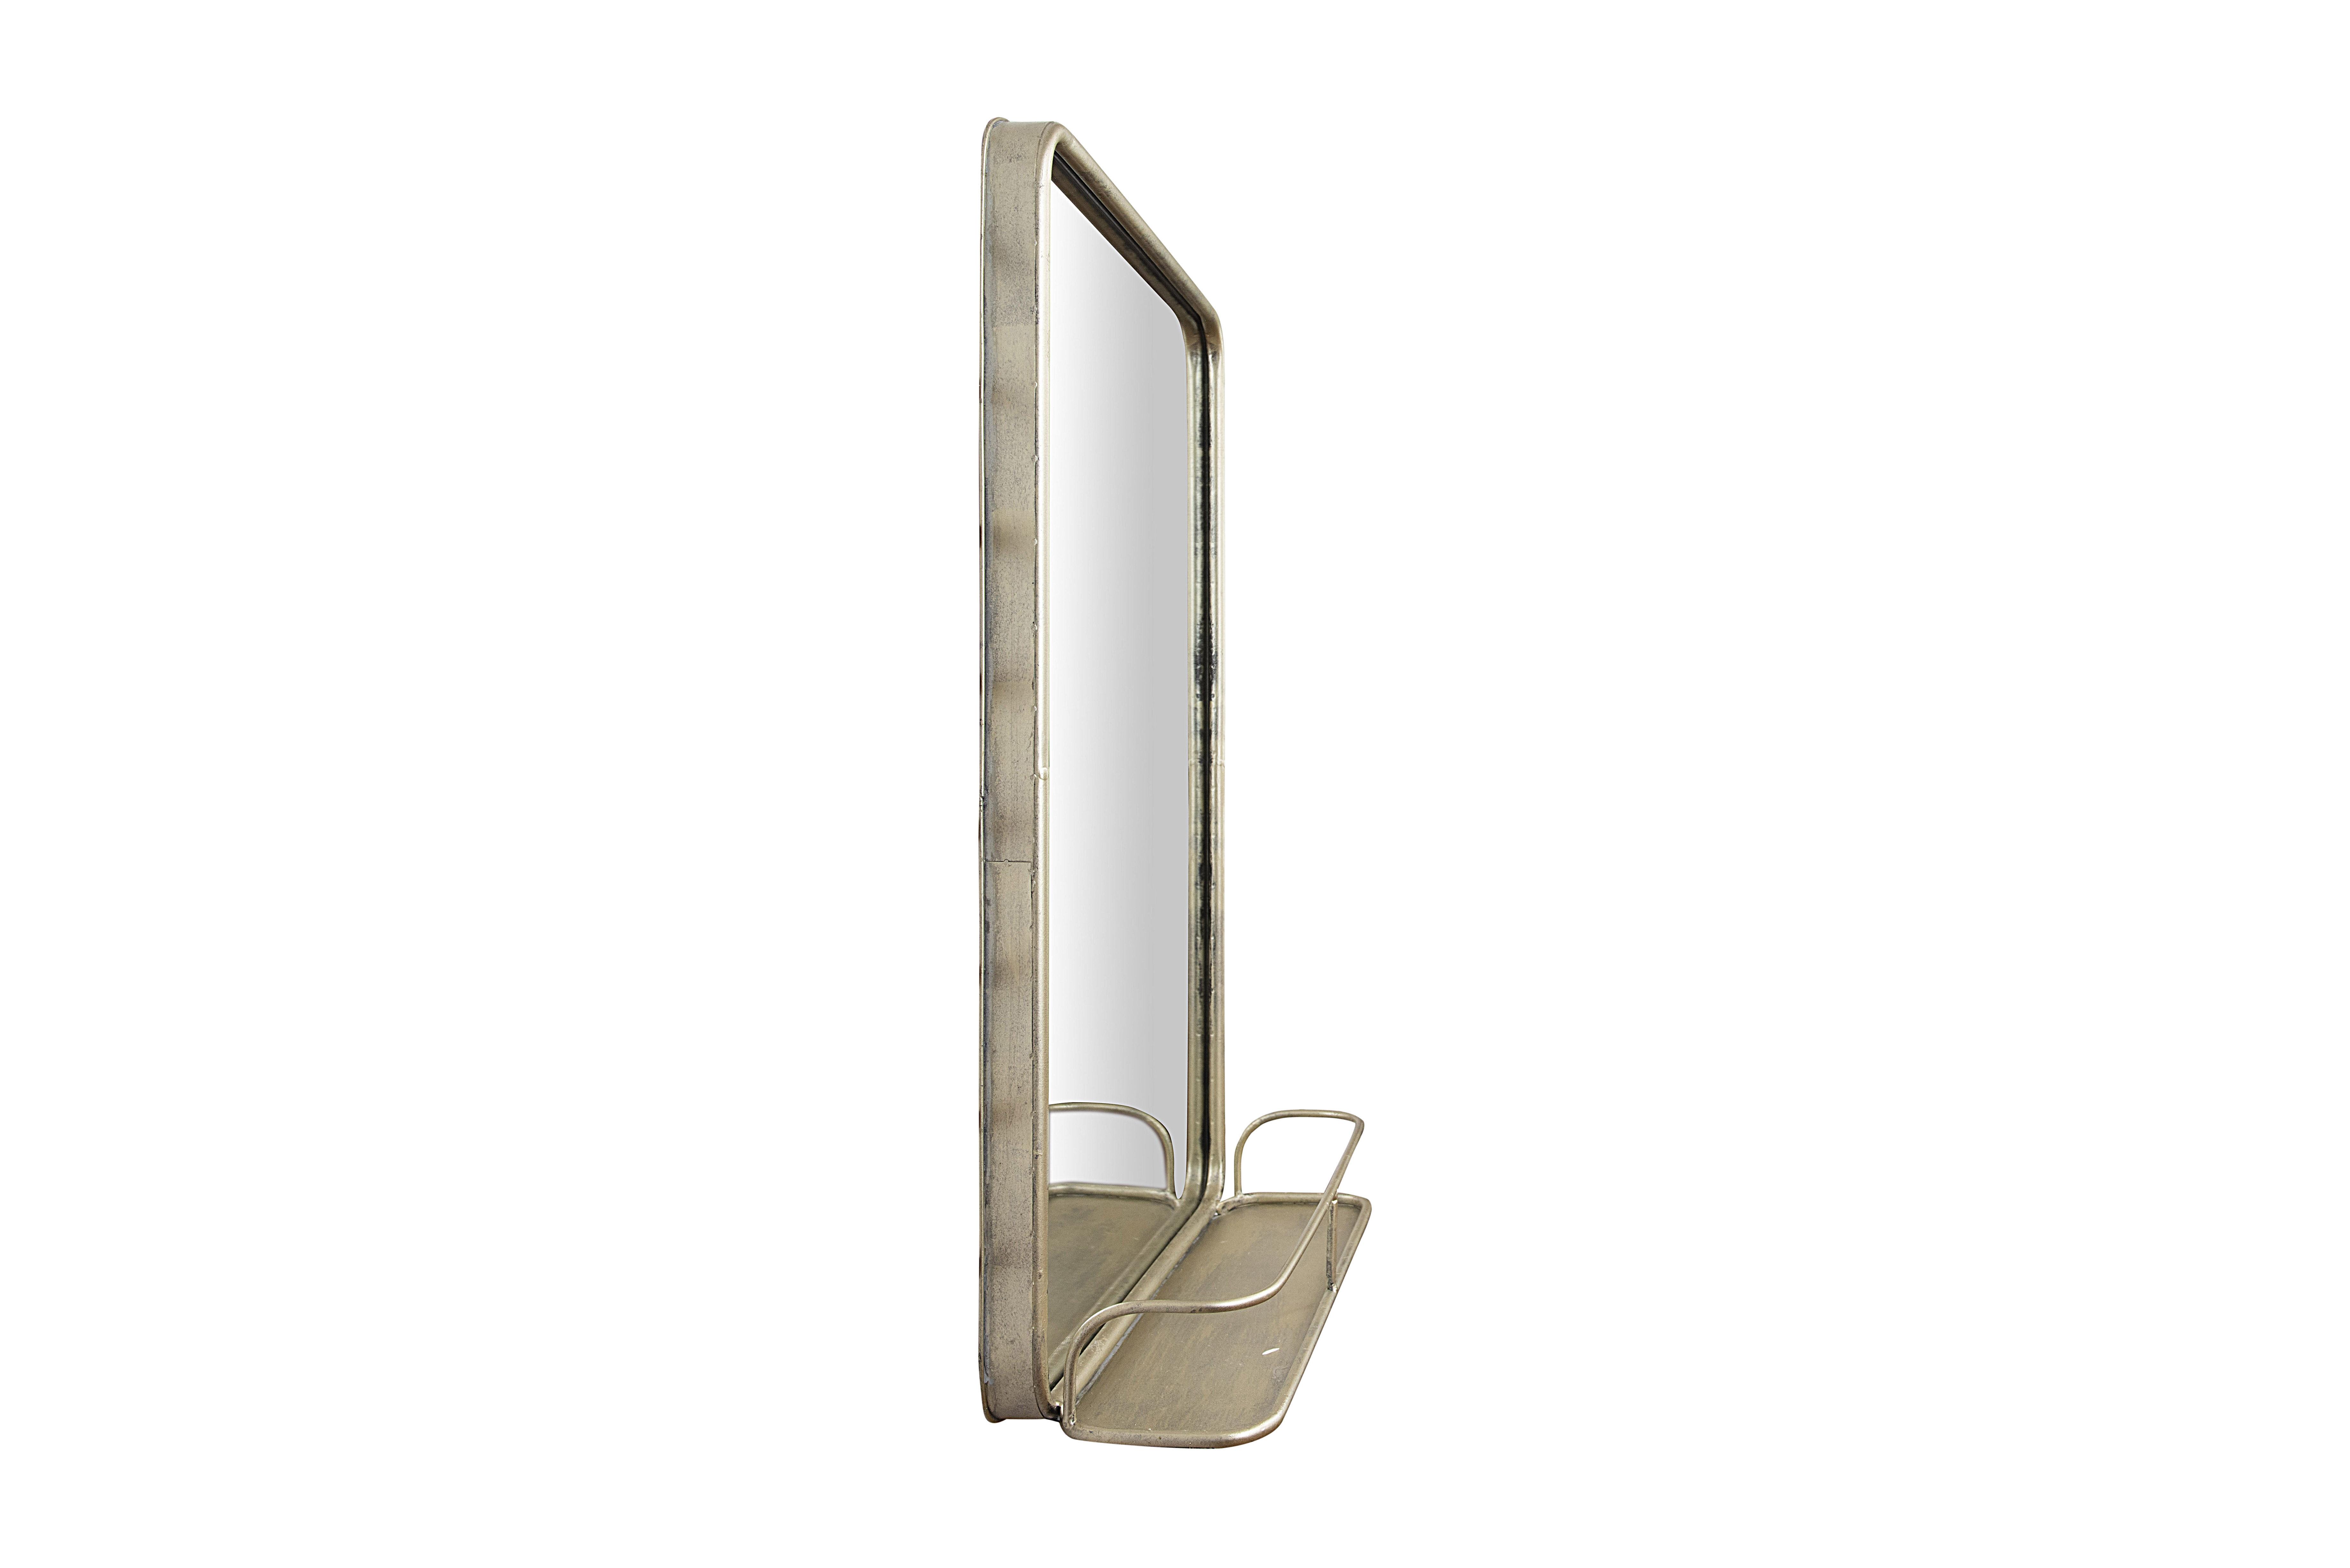 Peetz Modern Rustic Accent Mirror Pertaining To Peetz Modern Rustic Accent Mirrors (Image 25 of 30)